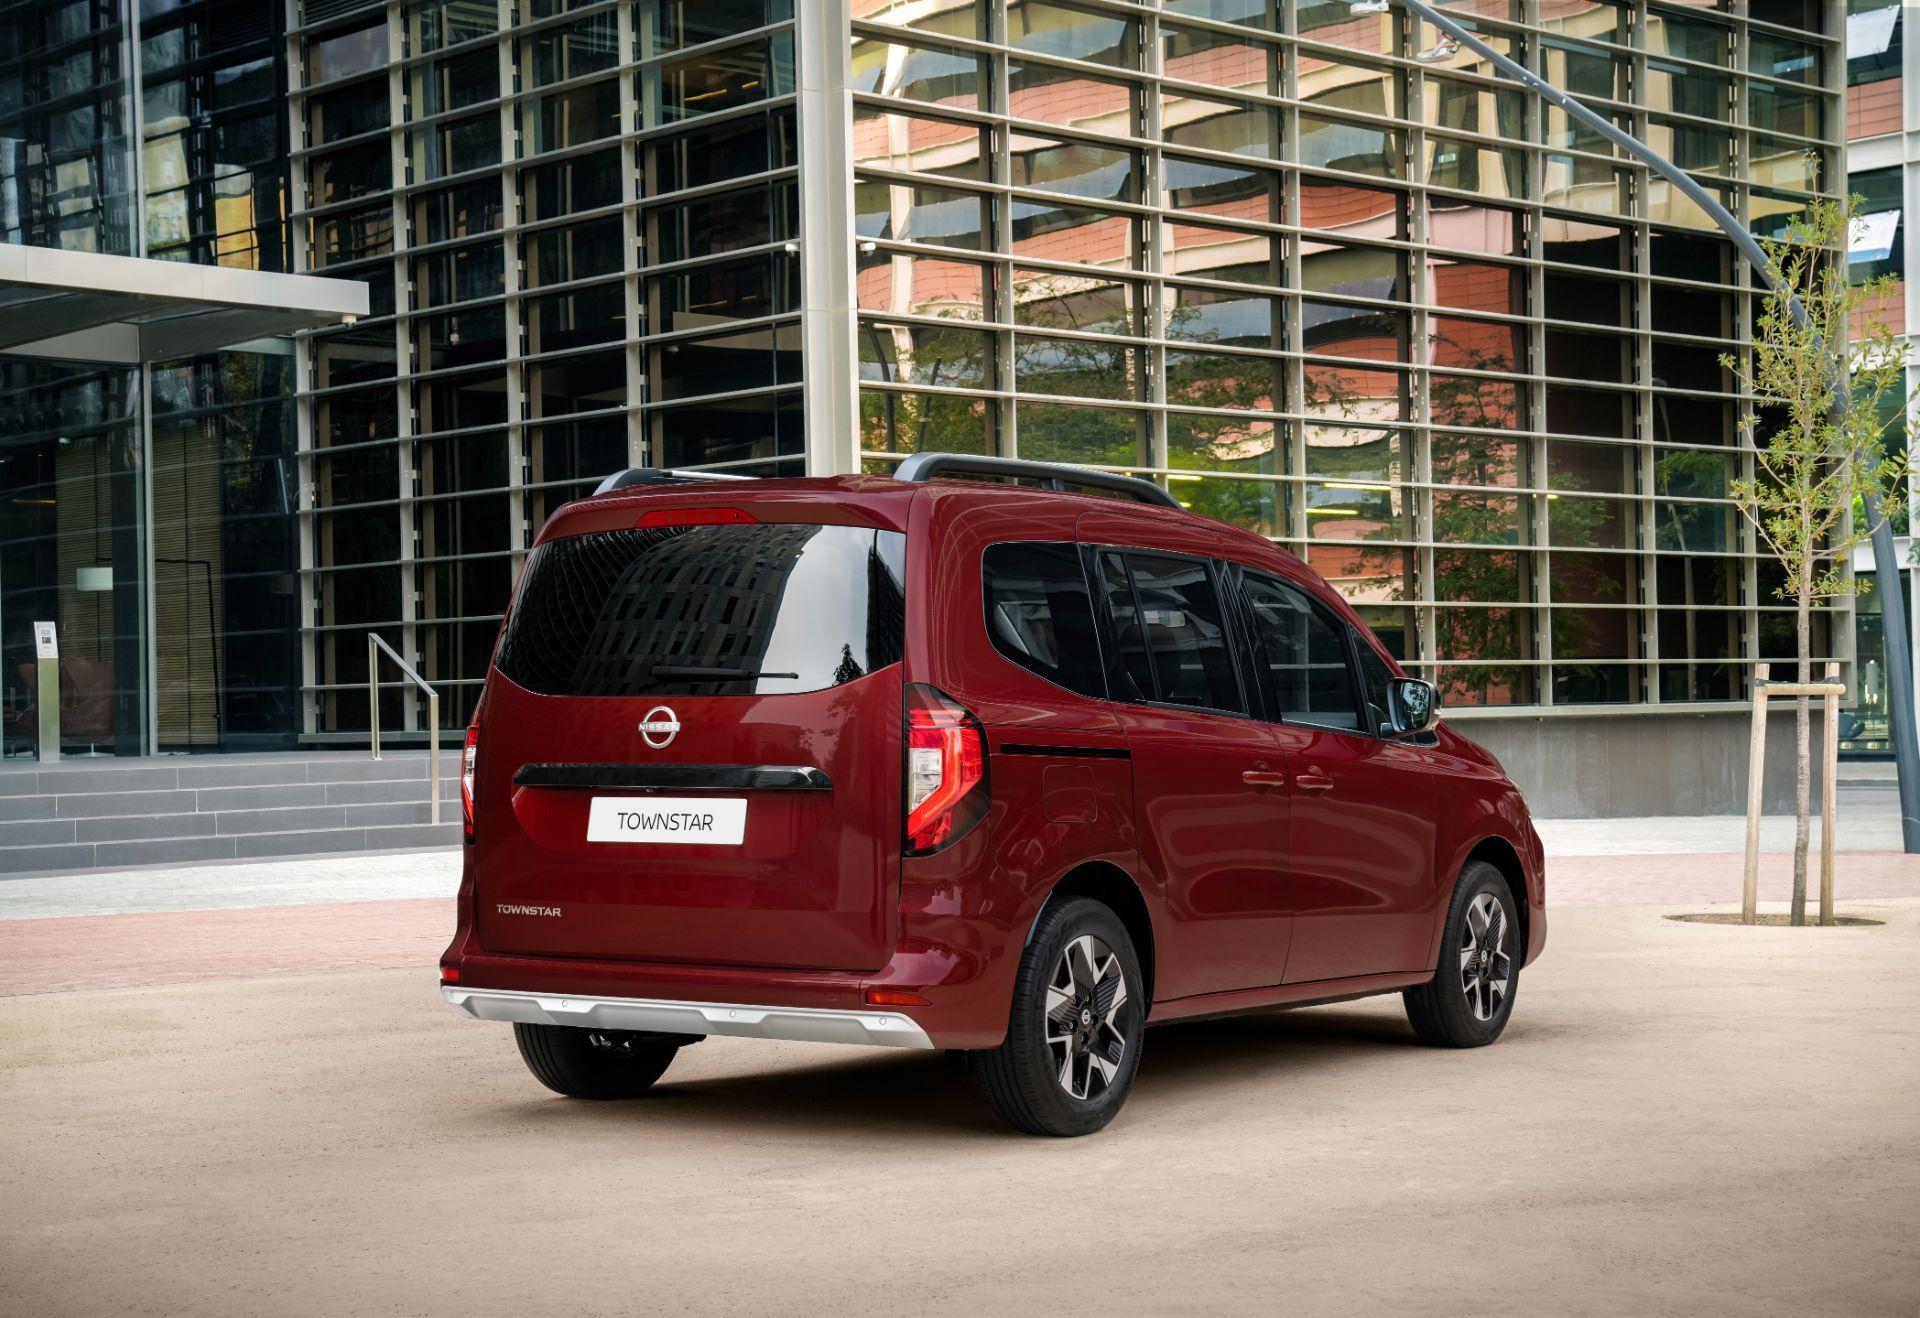 2022-Nissan-Townstar-petrol-combi-dynamic-3